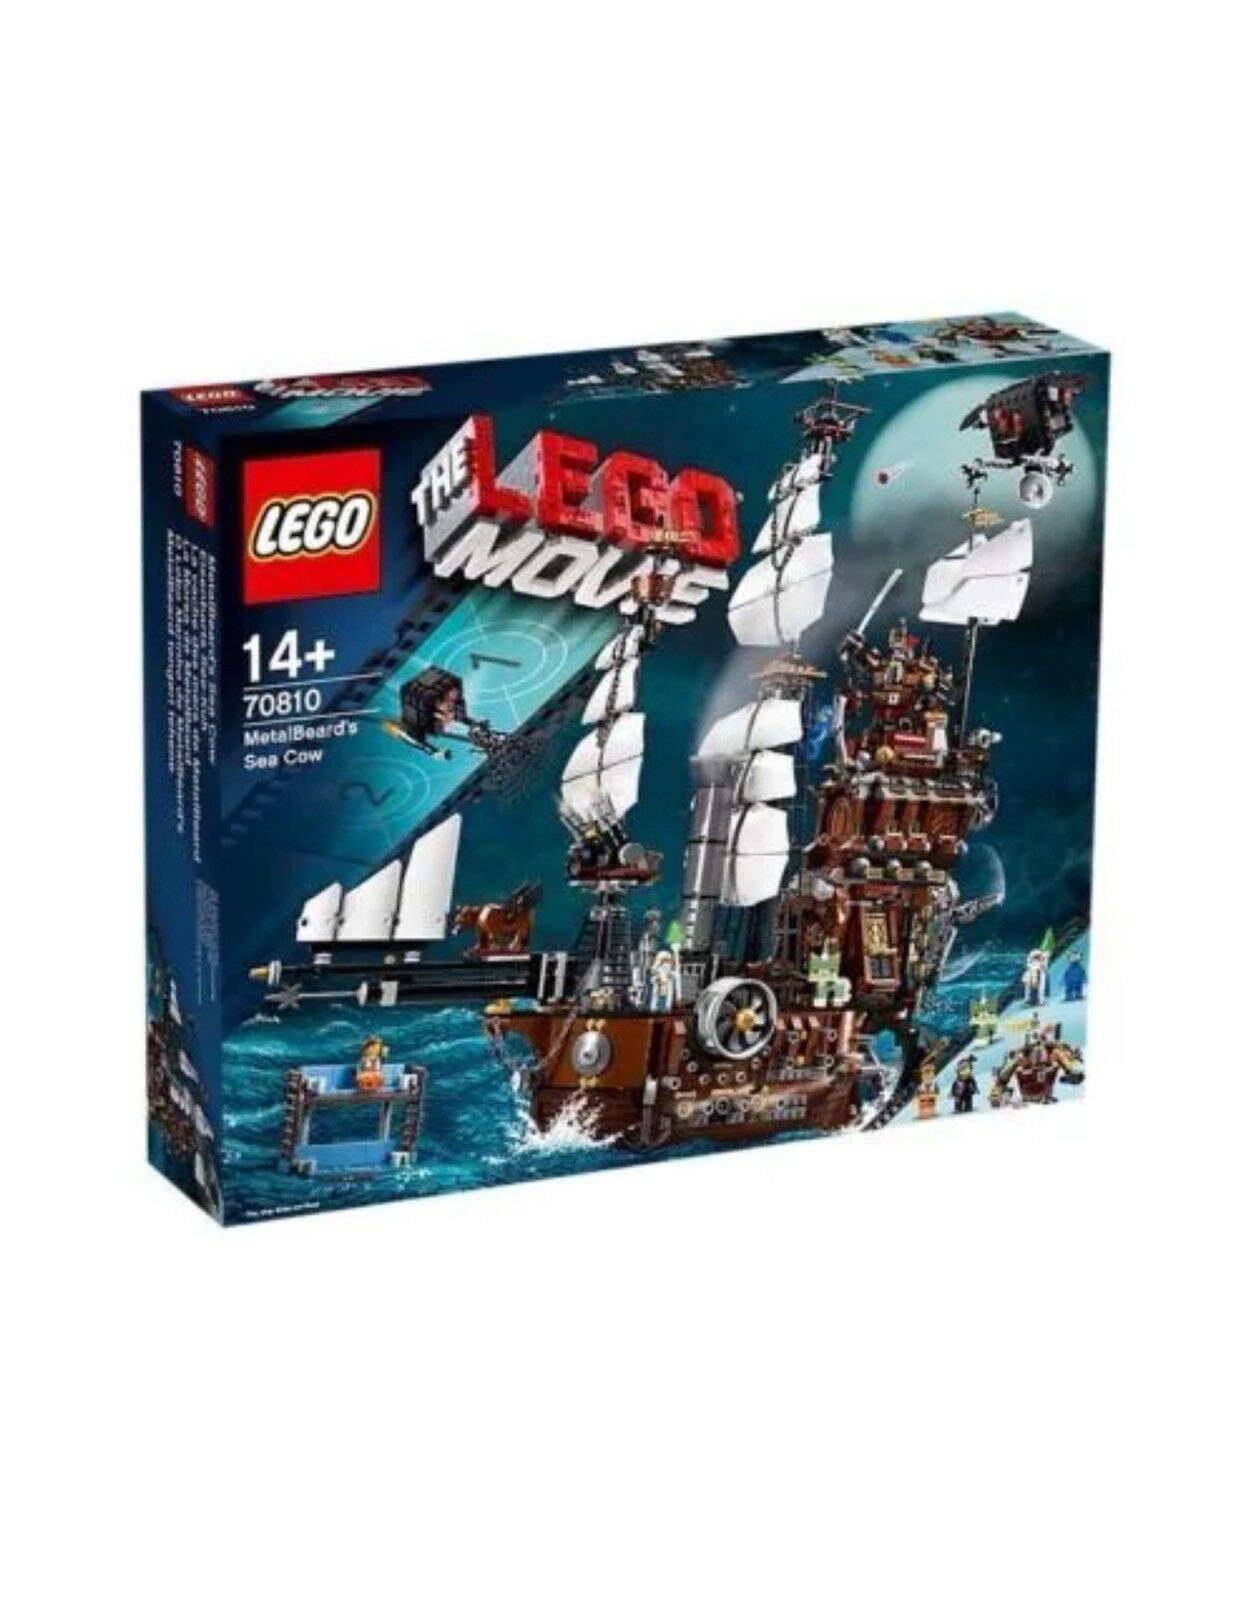 Film Lego 70810 MetalBeard's Sea Cow Neuf Scellé retraité